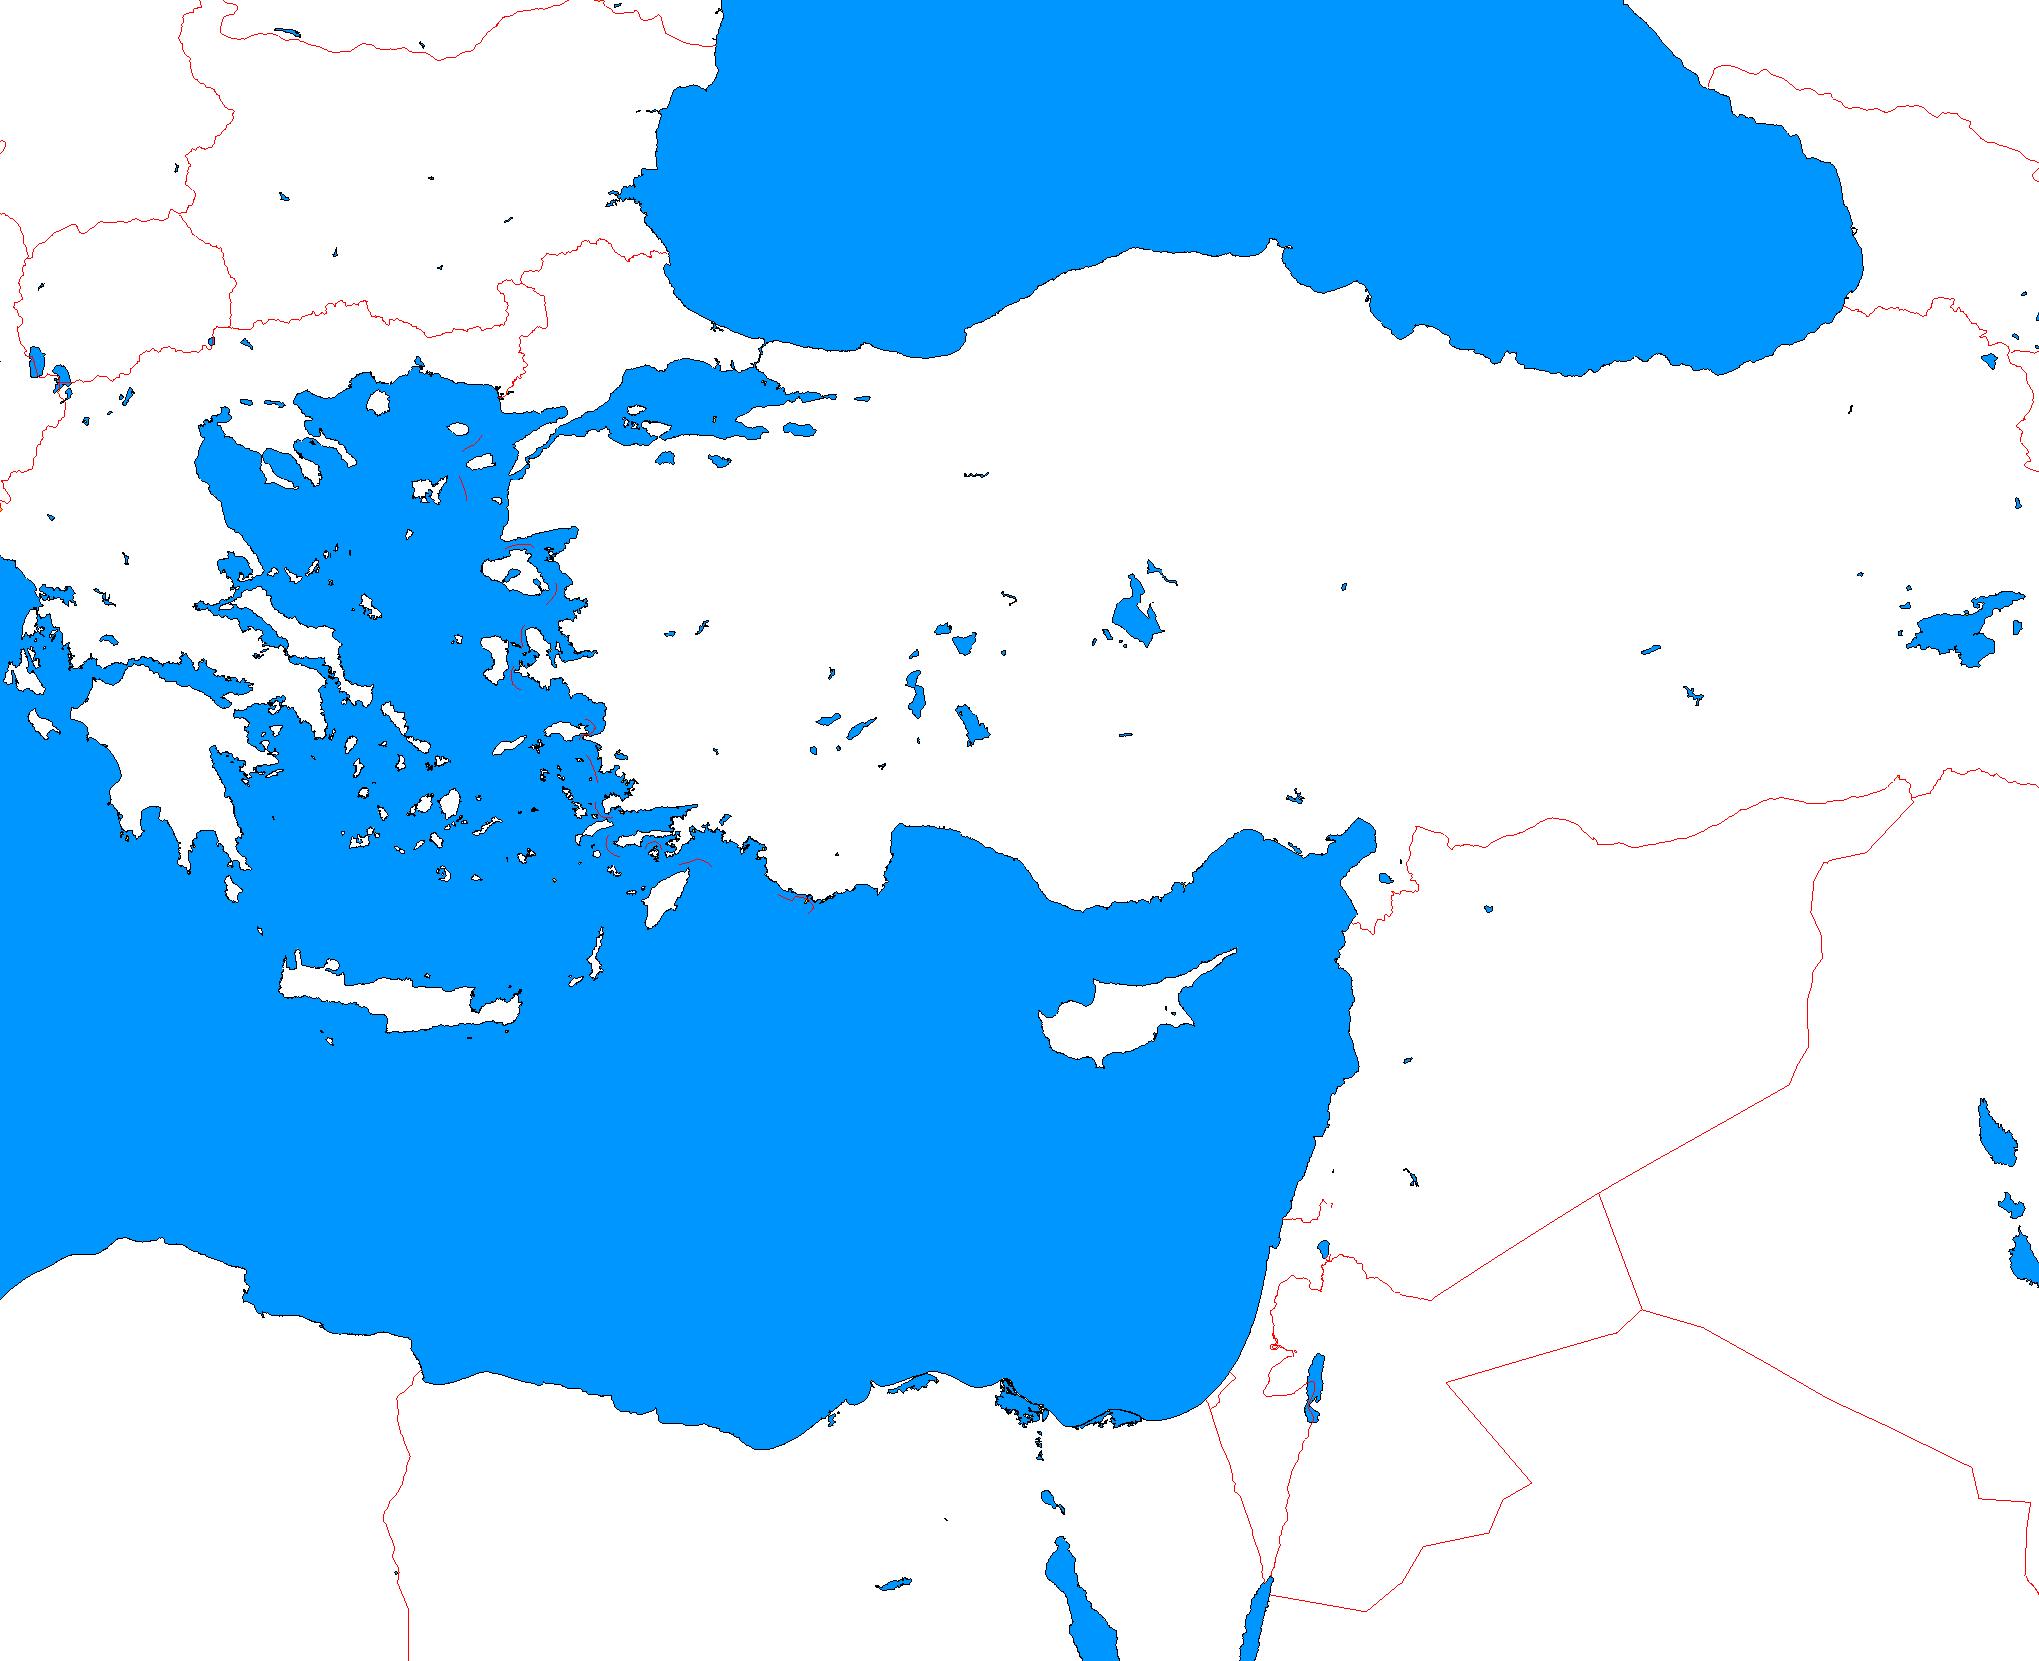 blank map of eastern mediterranean A Blank Map Thread Page 6 Alternatehistory Com blank map of eastern mediterranean